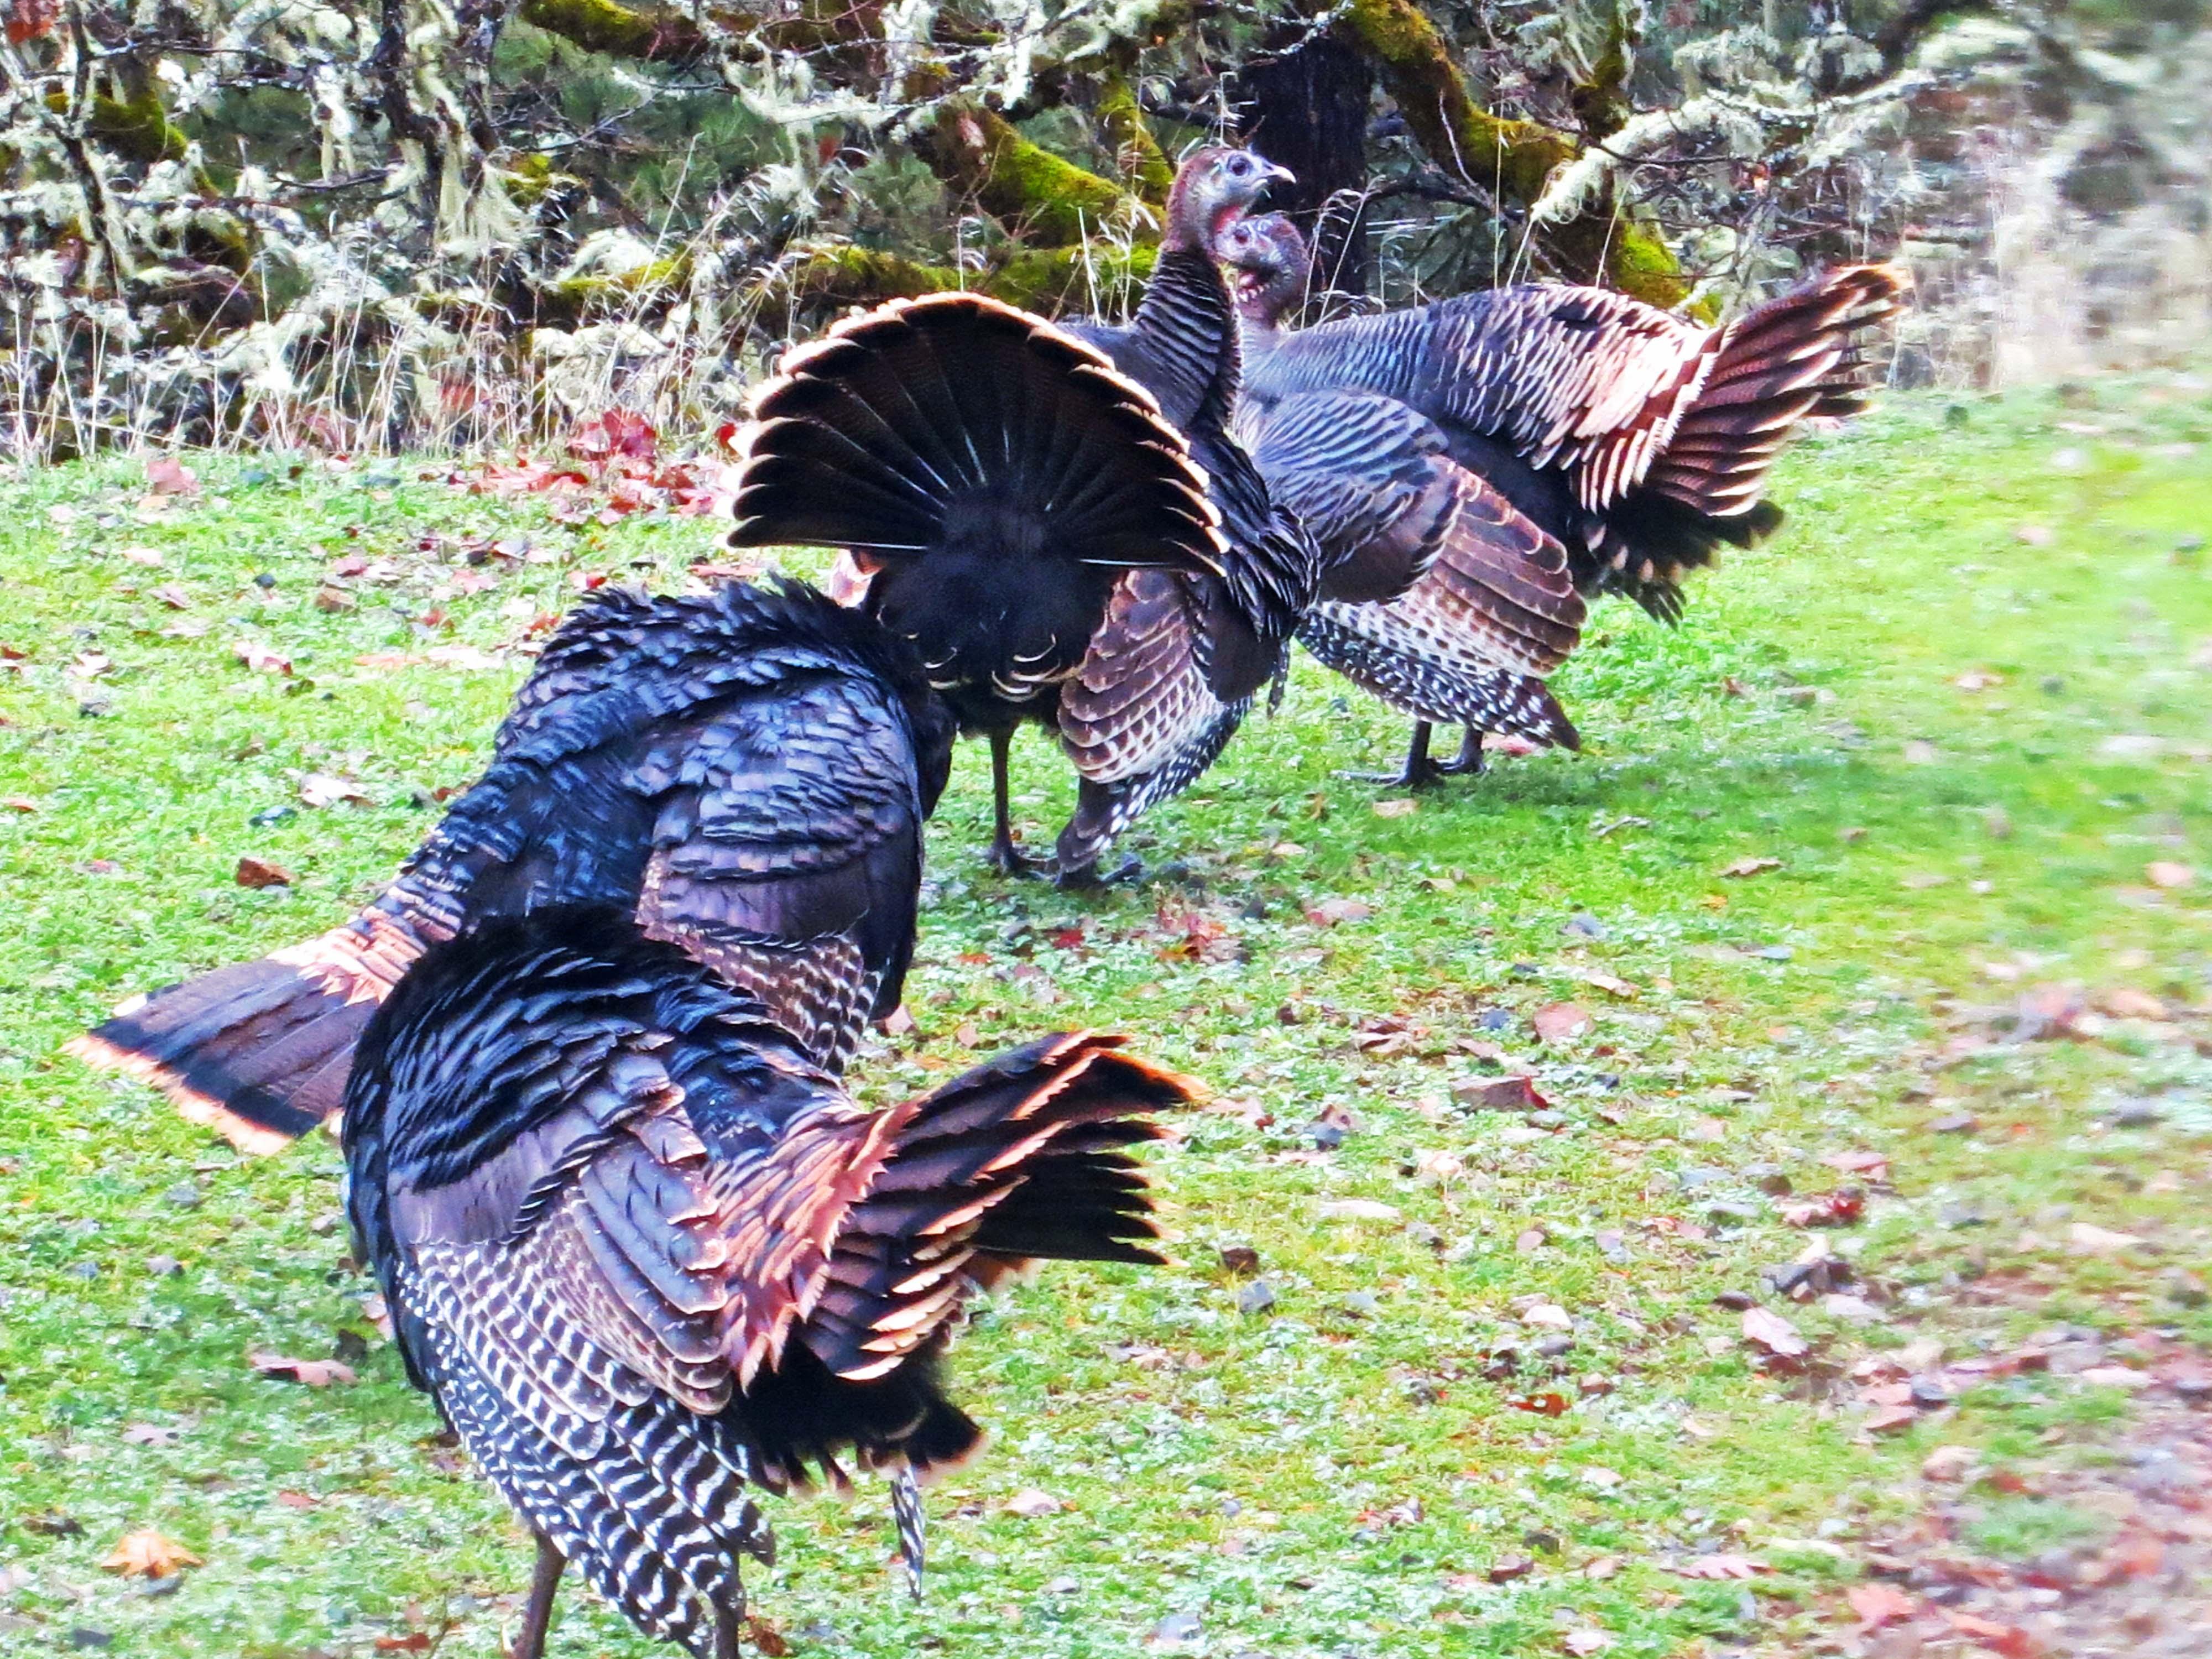 Wild turkeys on display in southern Oregon. Photo by Curtis Mekemson.